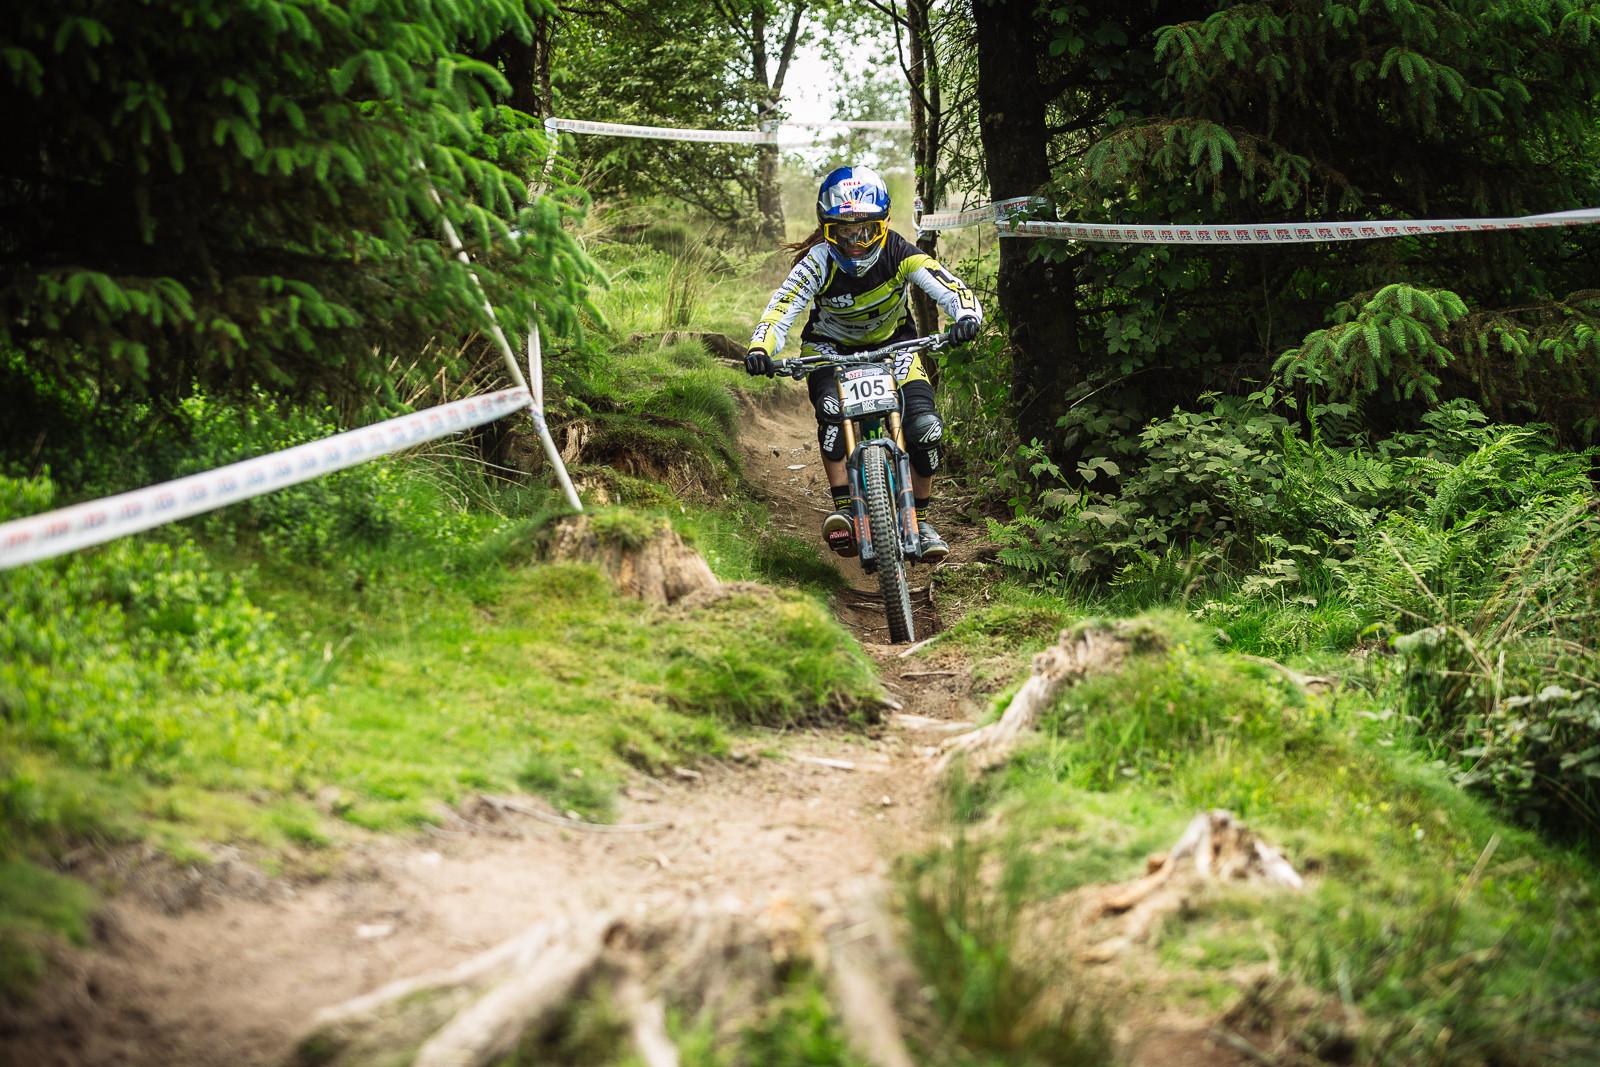 Rachel Atherton, 1st Place, British DH Series, Bala - RACE REPORT - 2015 British Downhill Series Bala - Mountain Biking Pictures - Vital MTB